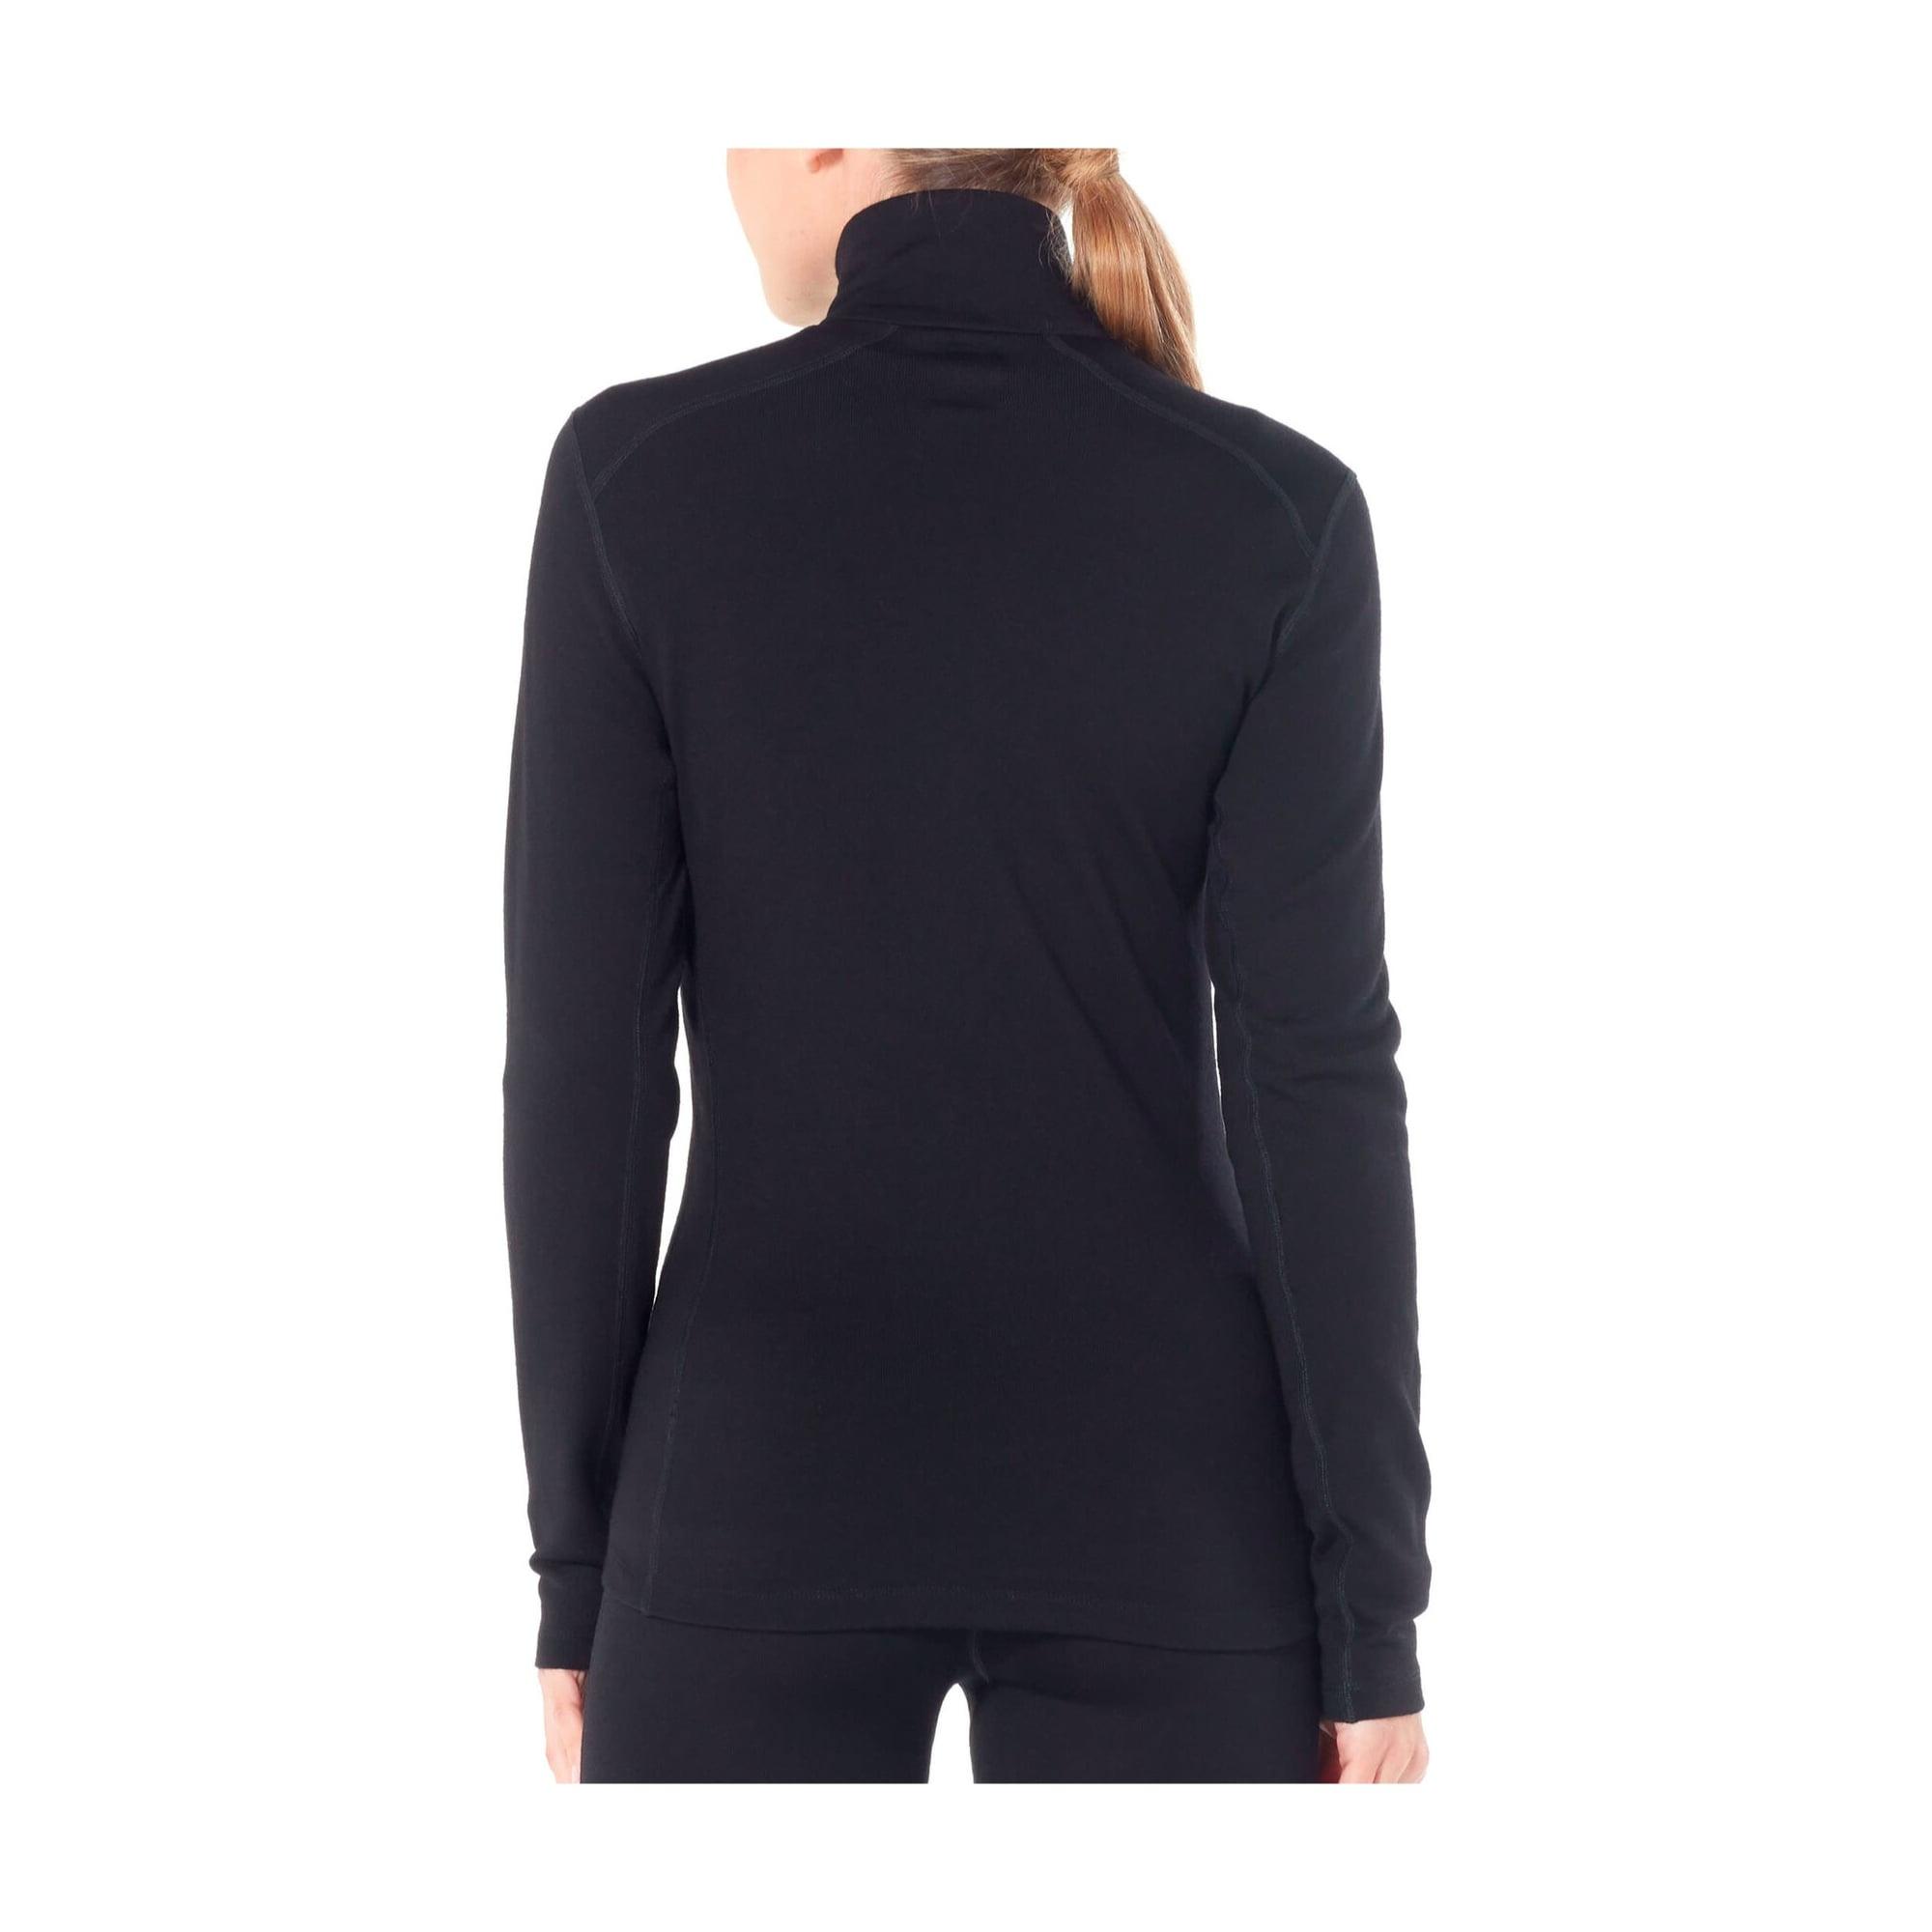 Women's 260 Tech Long Sleeve Half Zip-3